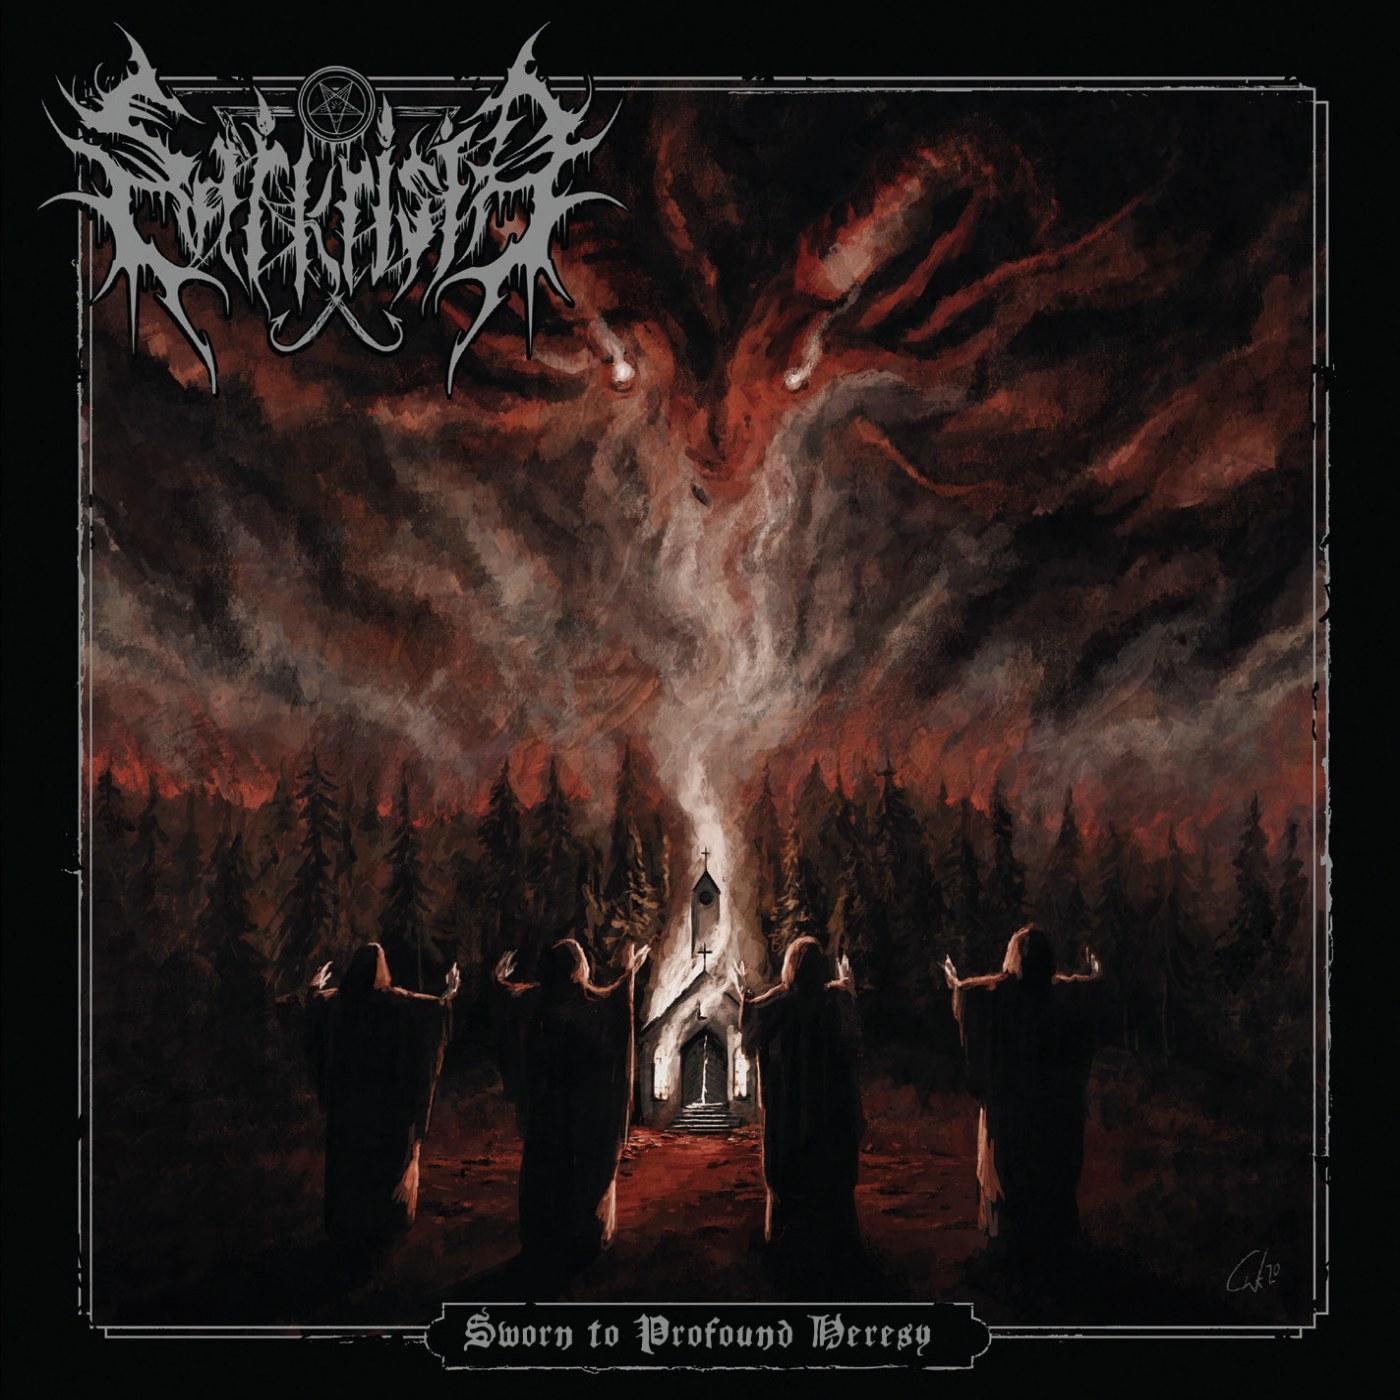 Sarkrista - Sworn to Profound Heresy